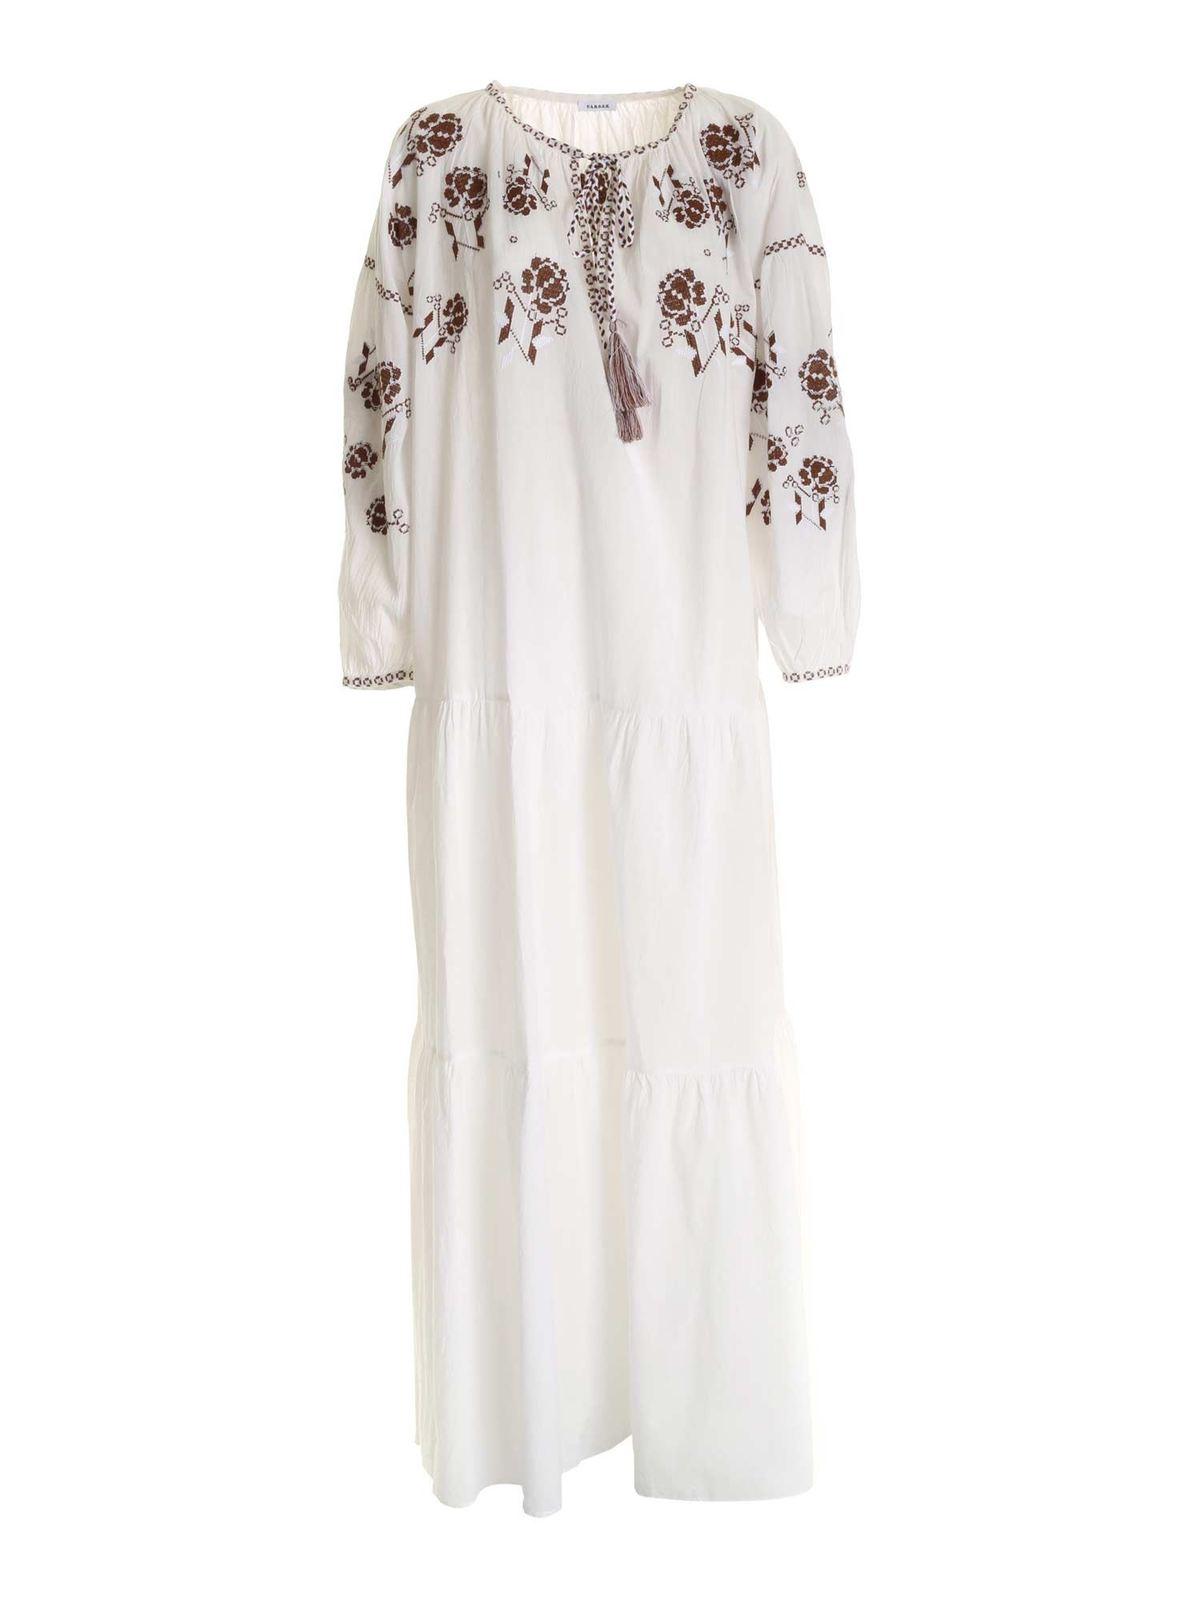 P.a.r.o.s.h. CROSS STITCH EMBROIDERY DRESS IN WHITE